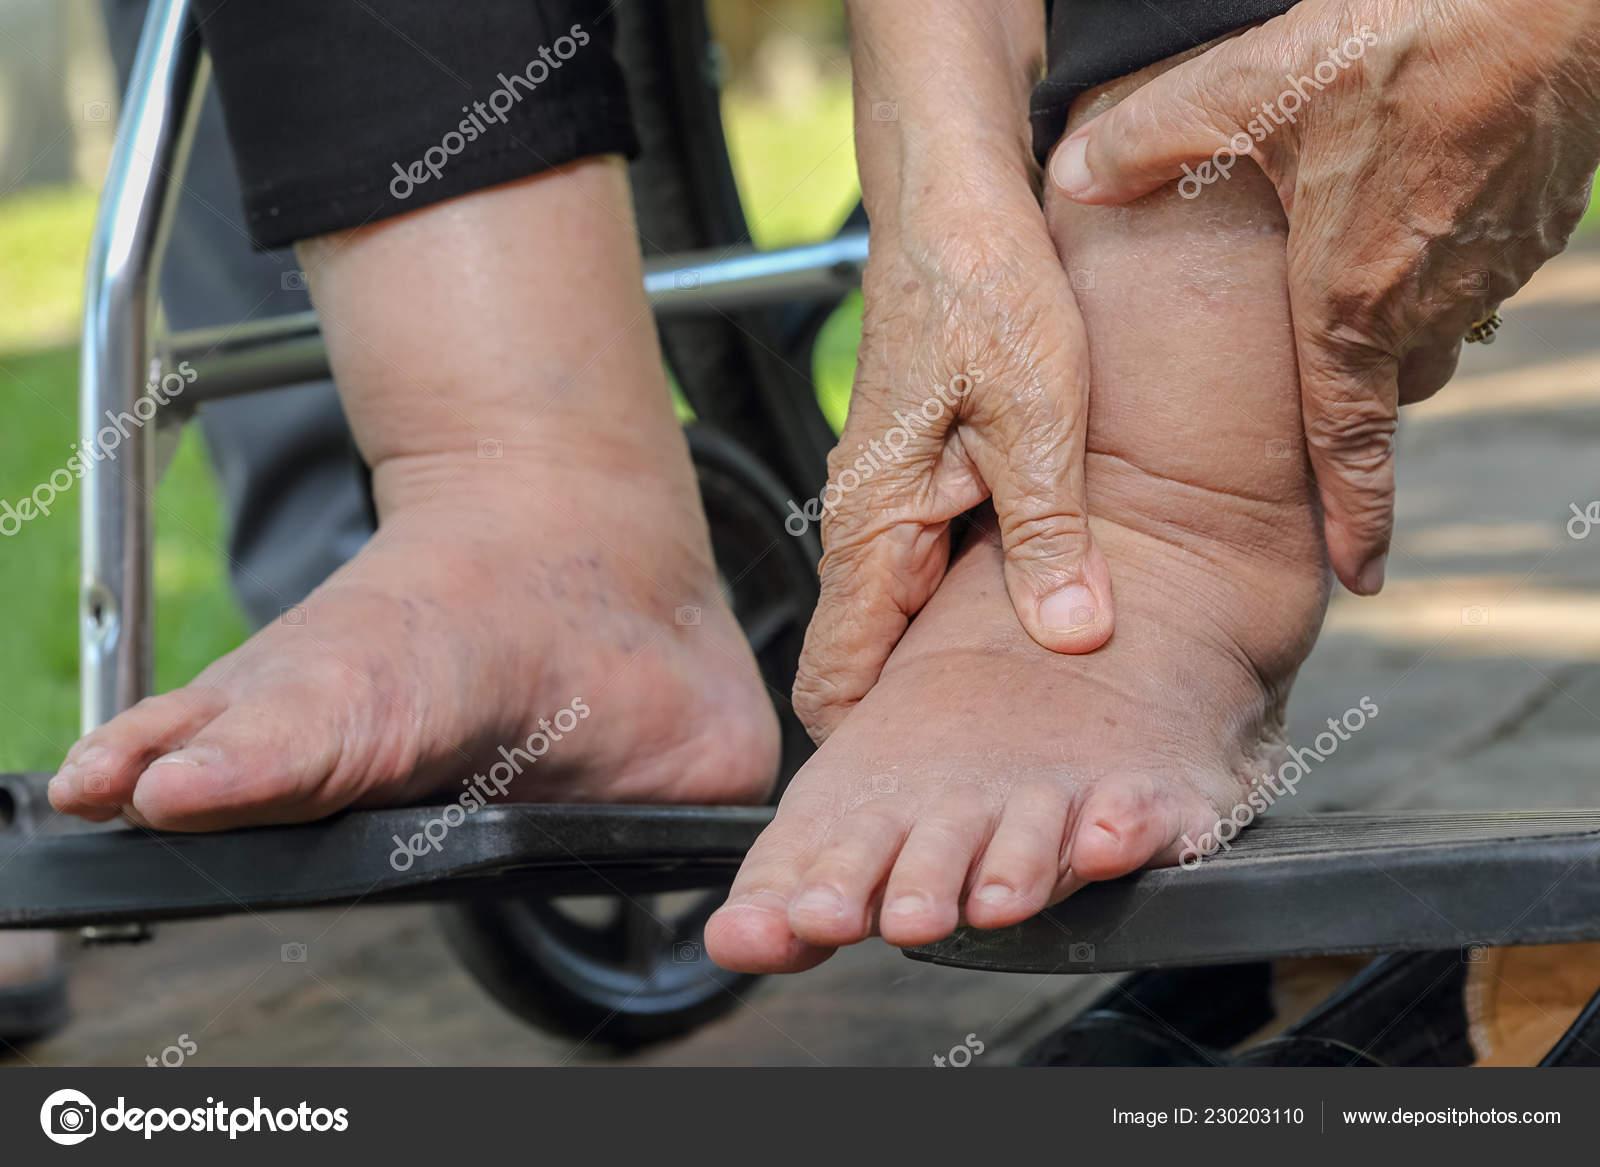 Pictures : pitting edema   Elderly Woman Swollen Feet Press